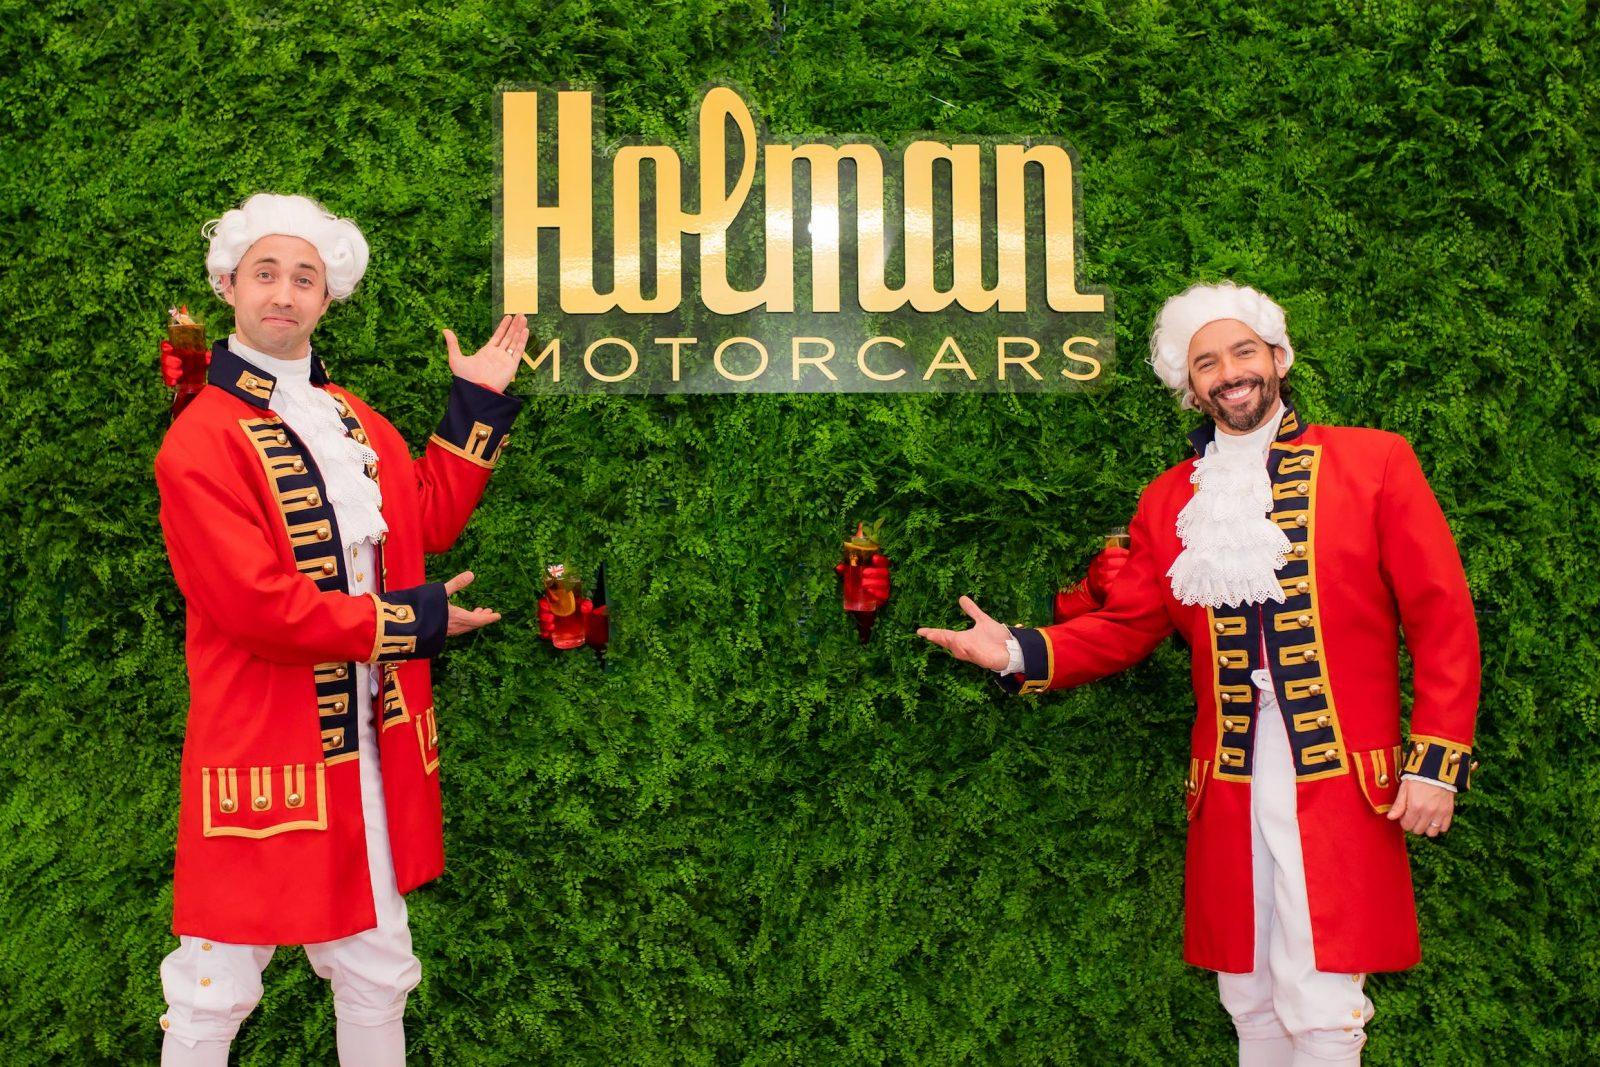 Holman Motorcars